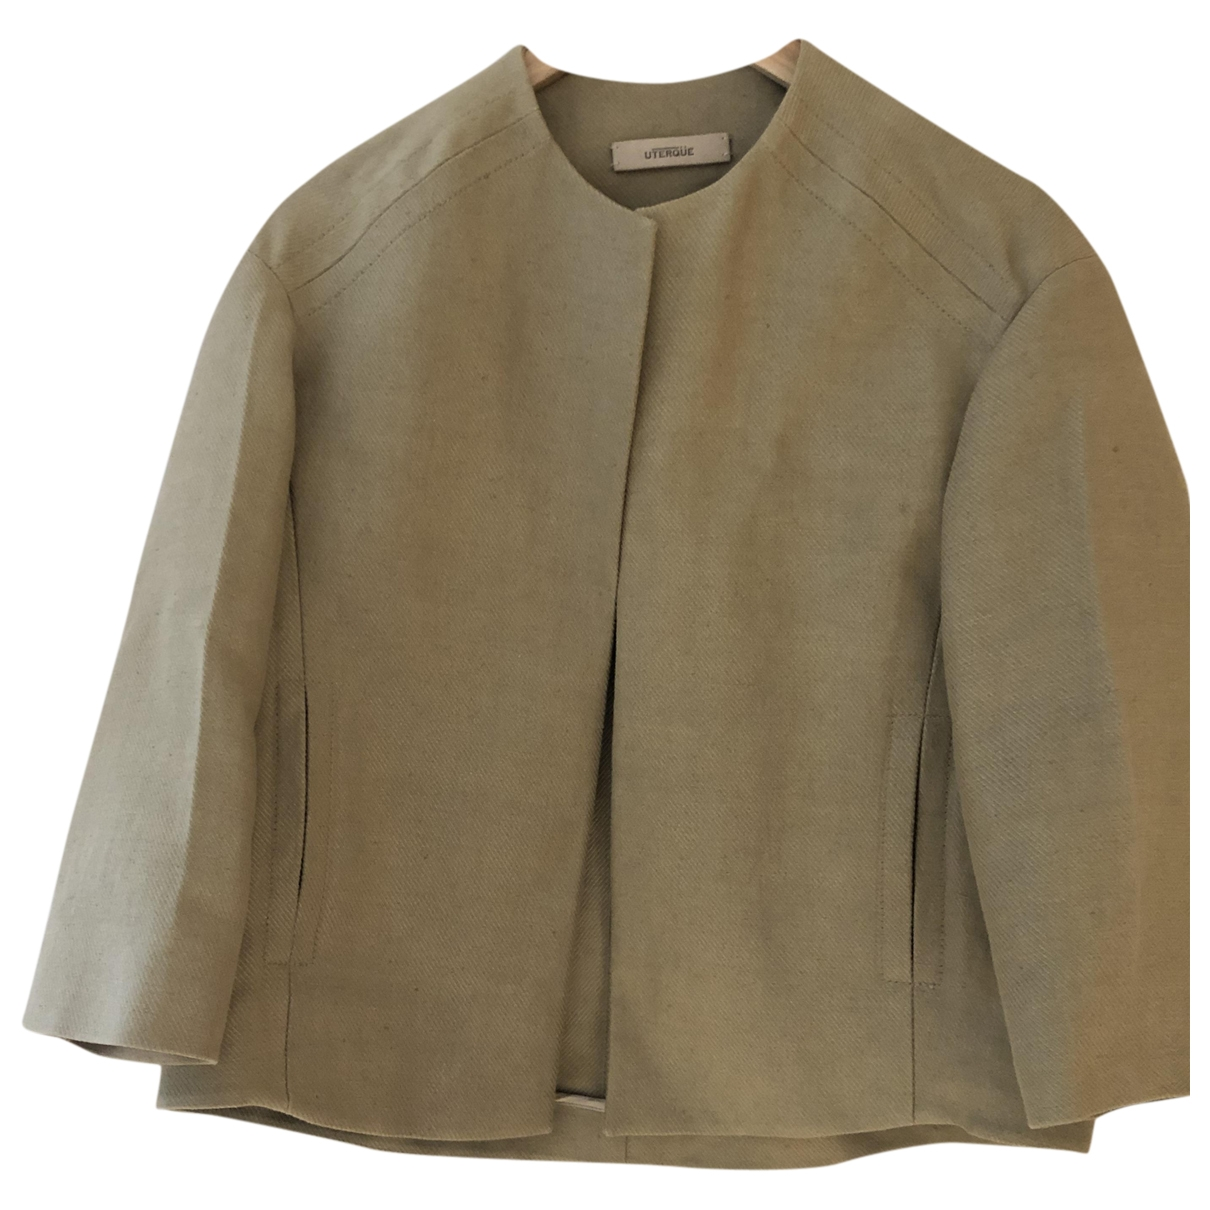 Uterque \N Camel Linen jacket for Women S International